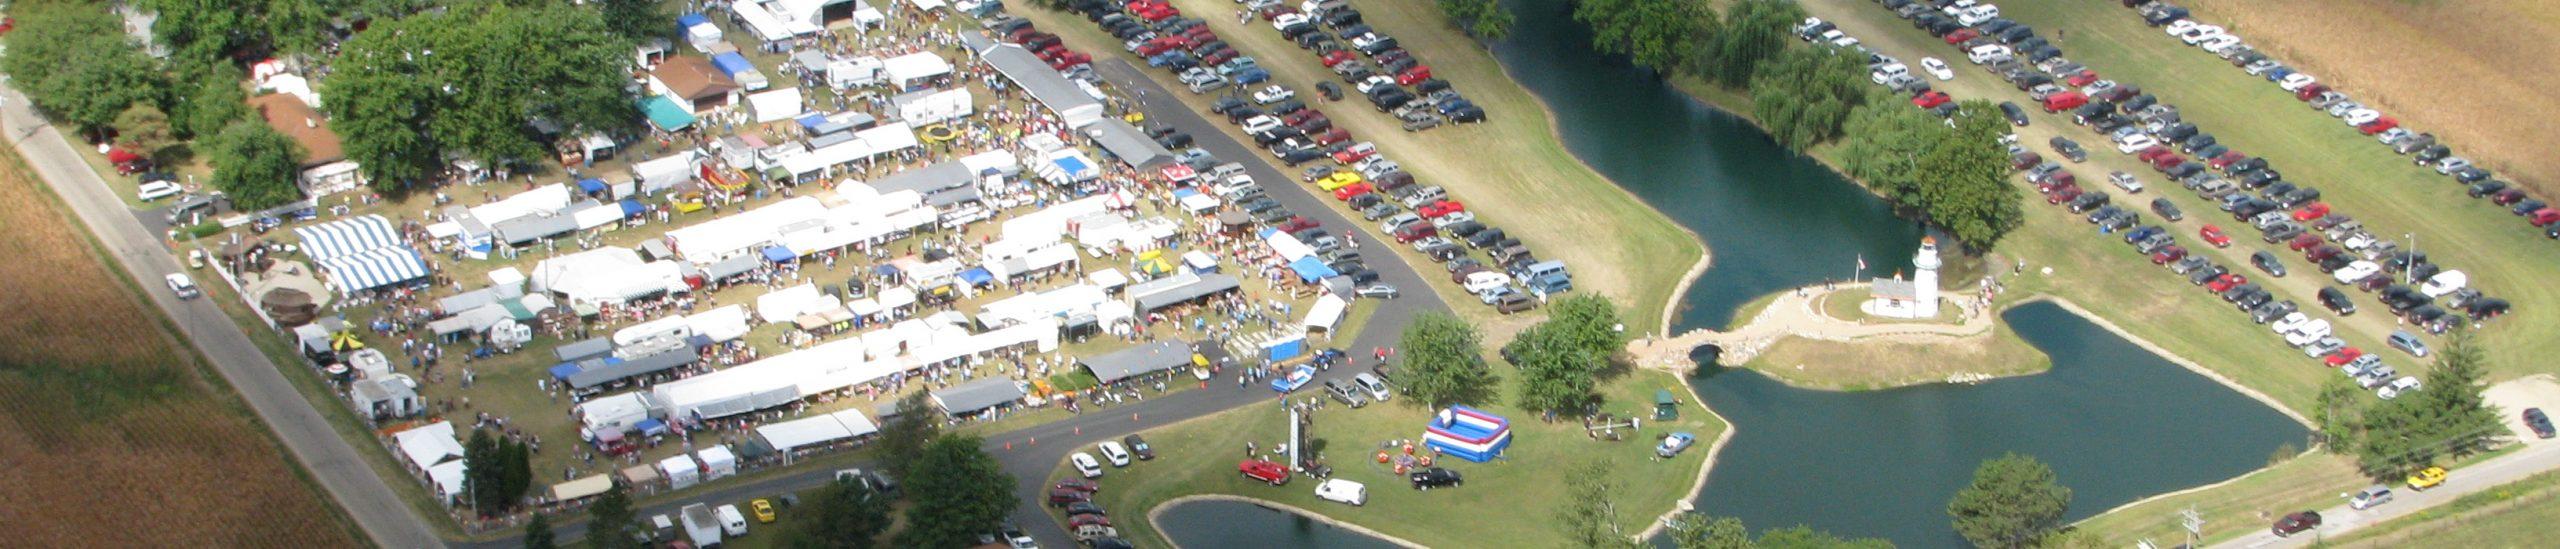 Farmers Pike Festival